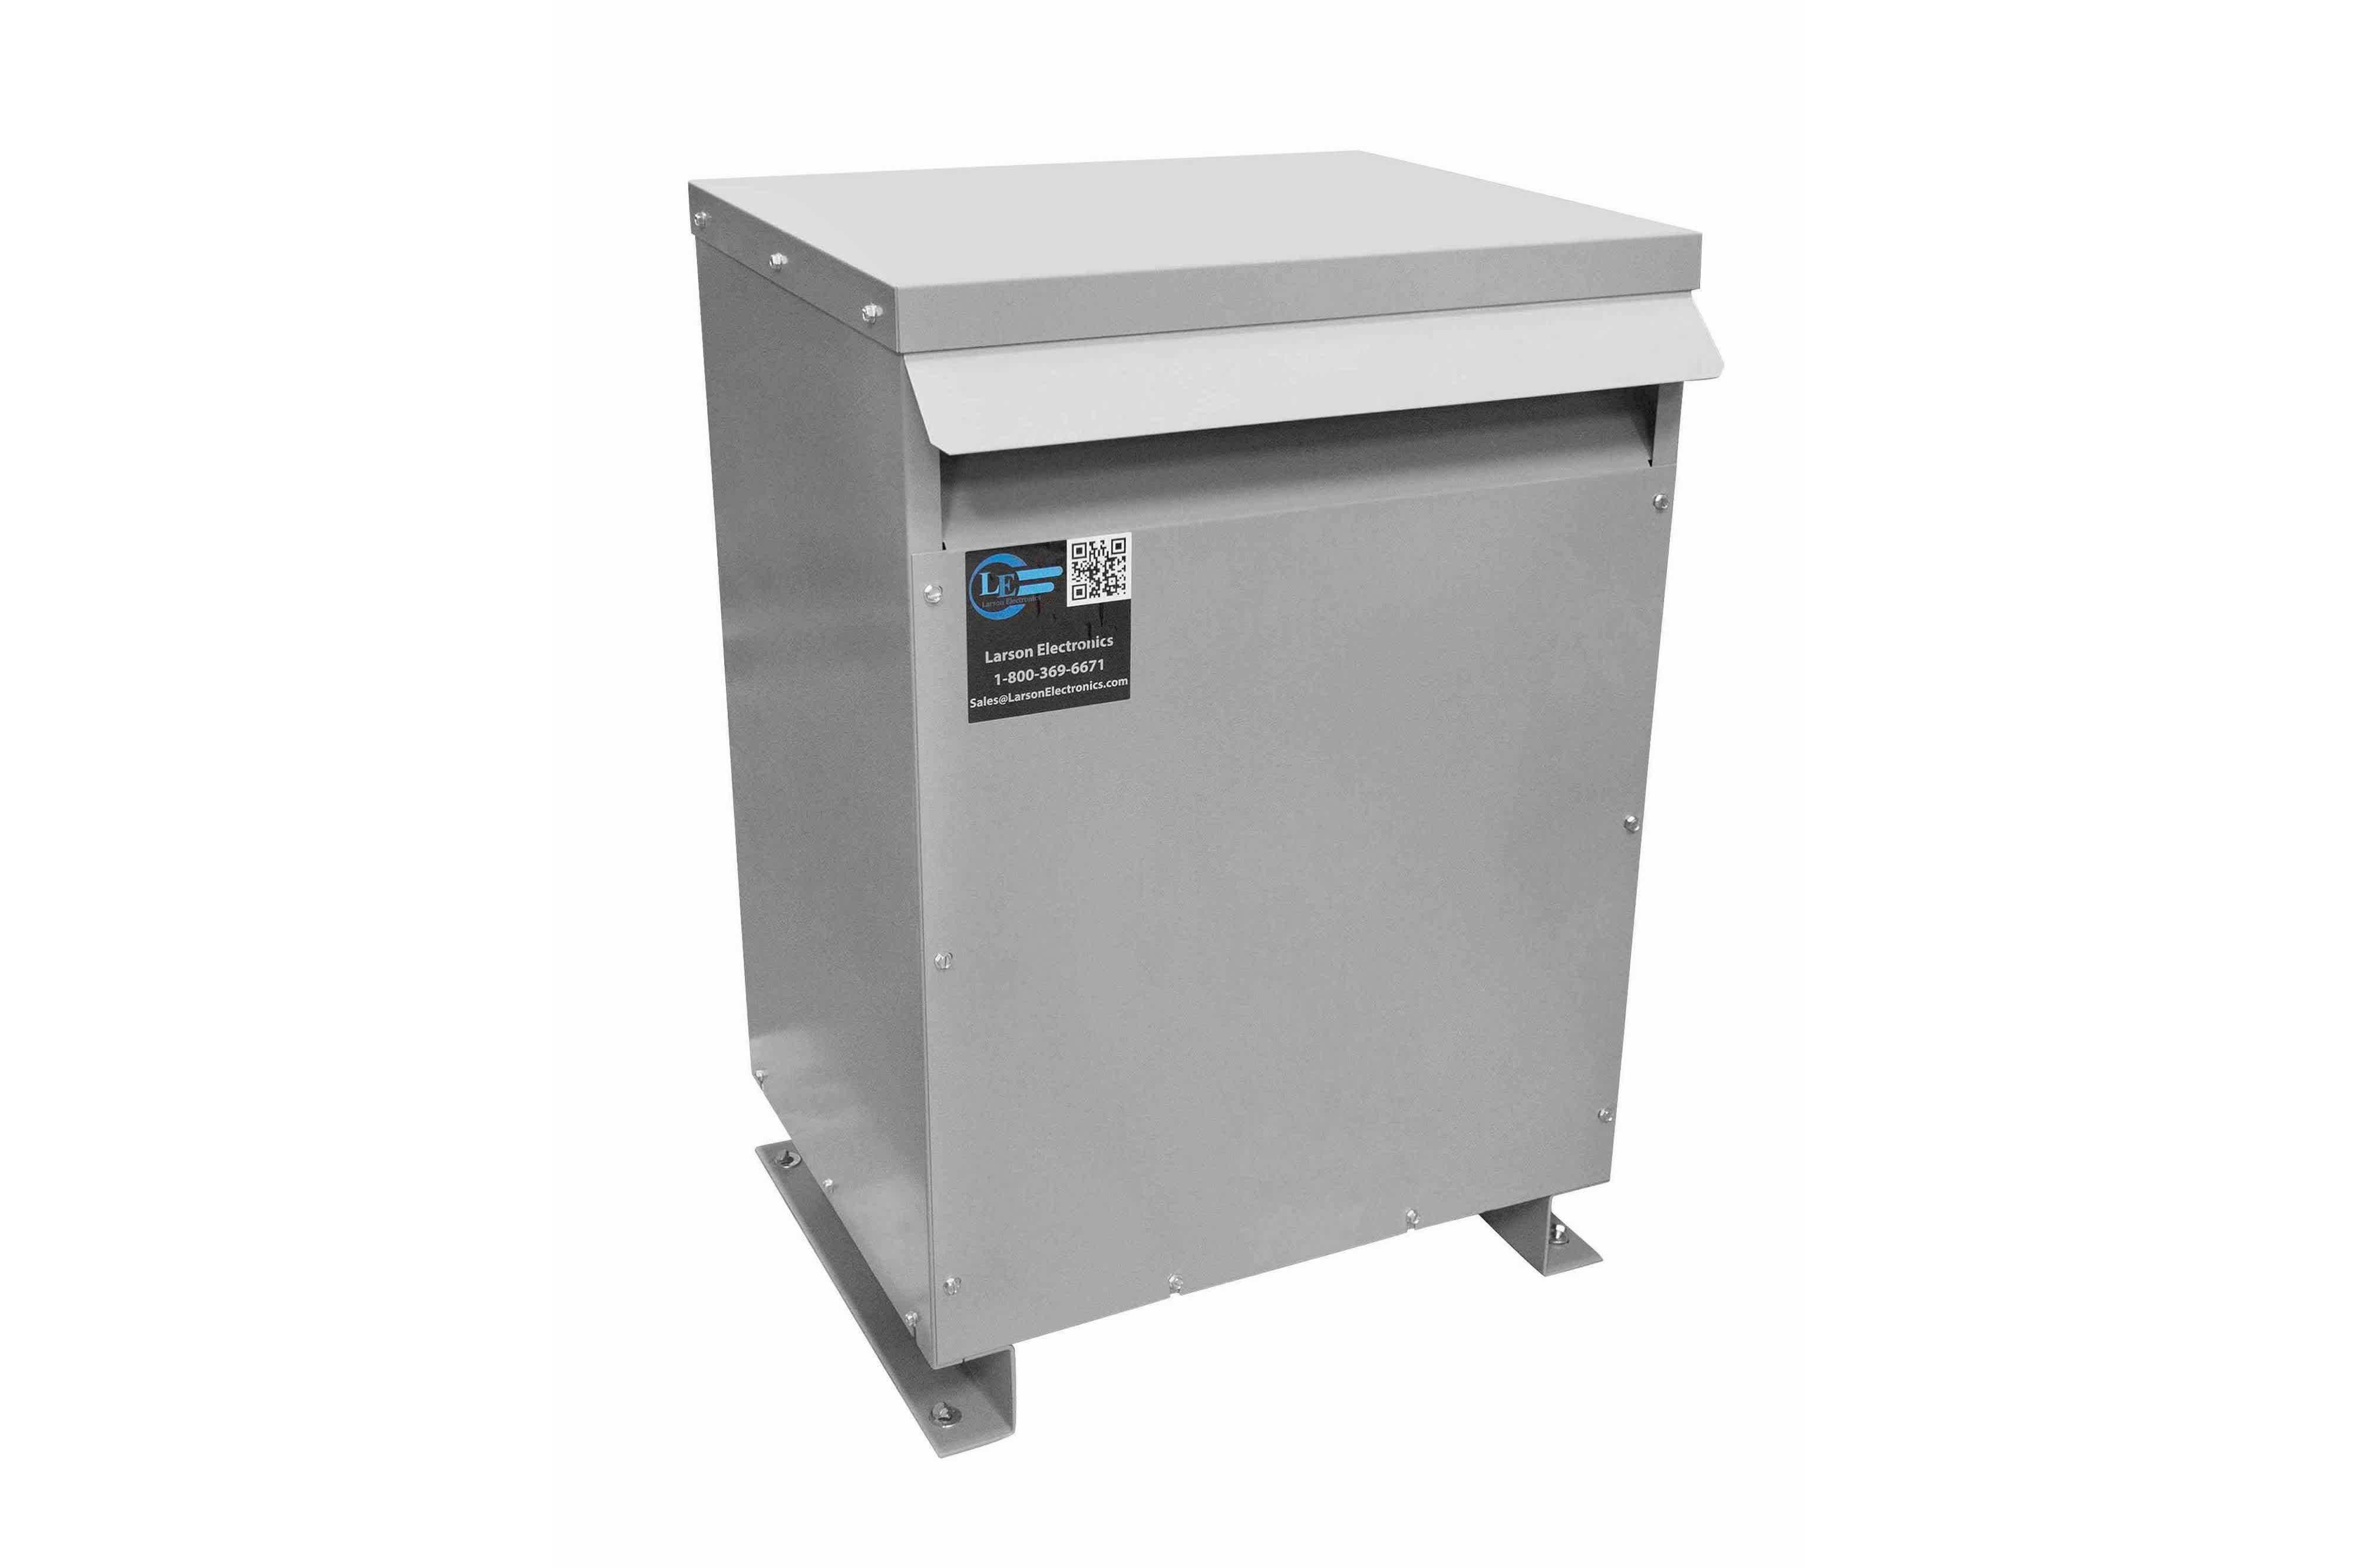 700 kVA 3PH Isolation Transformer, 600V Wye Primary, 208V Delta Secondary, N3R, Ventilated, 60 Hz